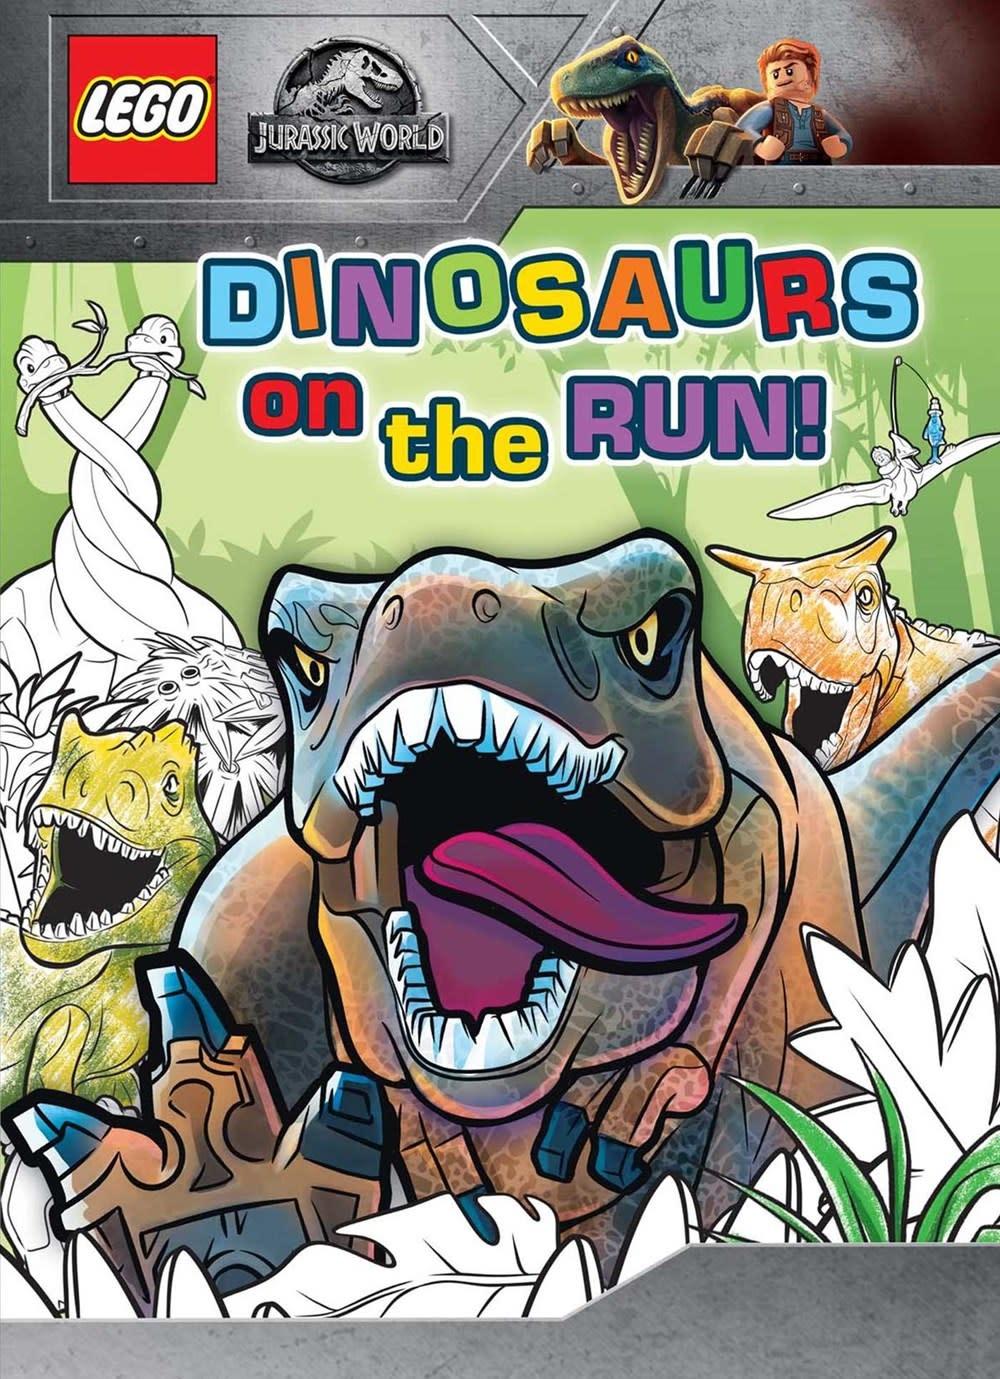 Printers Row LEGO Jurassic World: Dinosaurs on the Run!